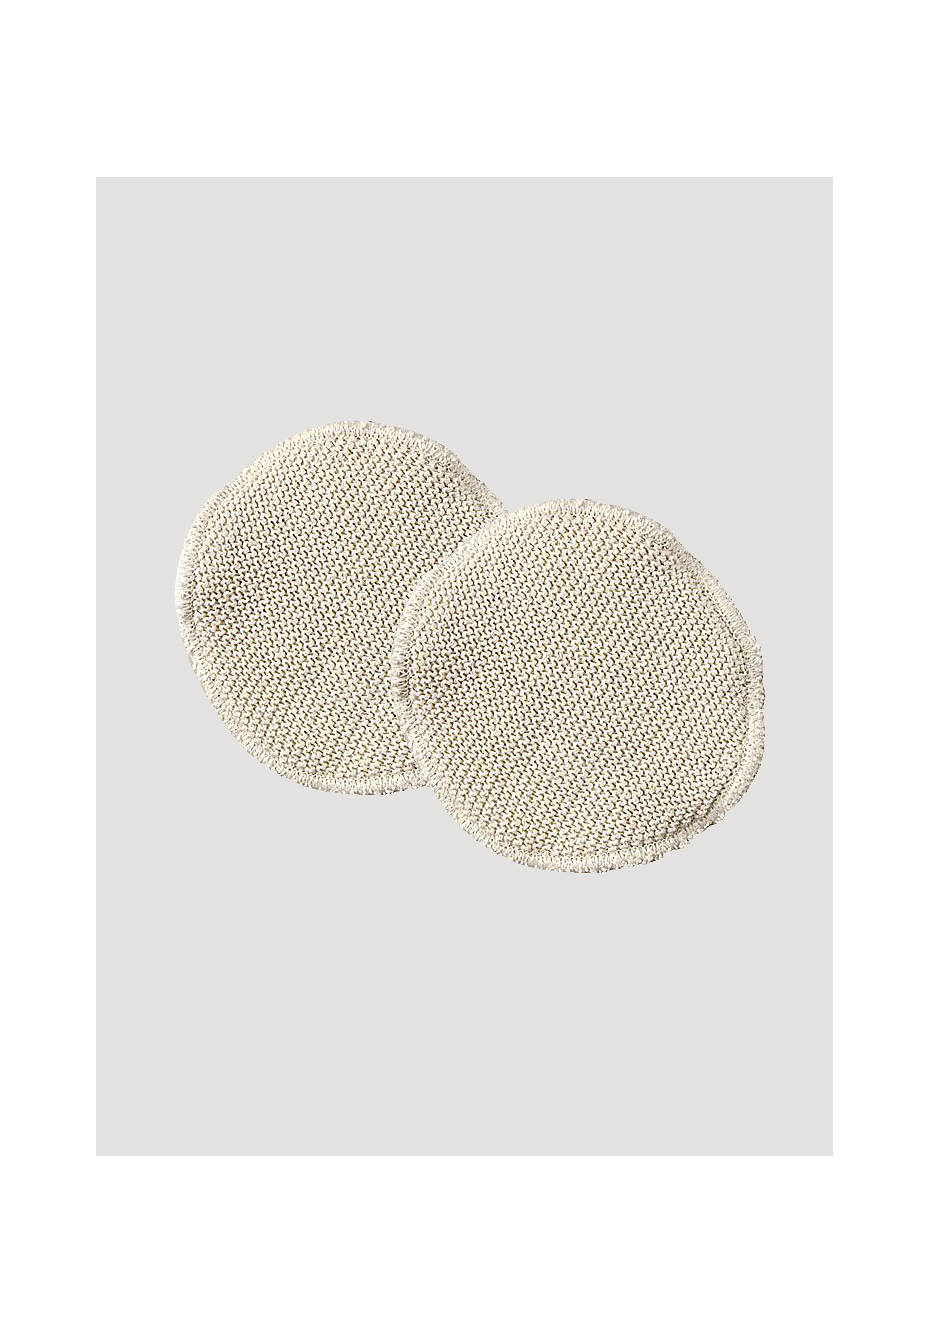 Nursing pads made of silk with organic new wool